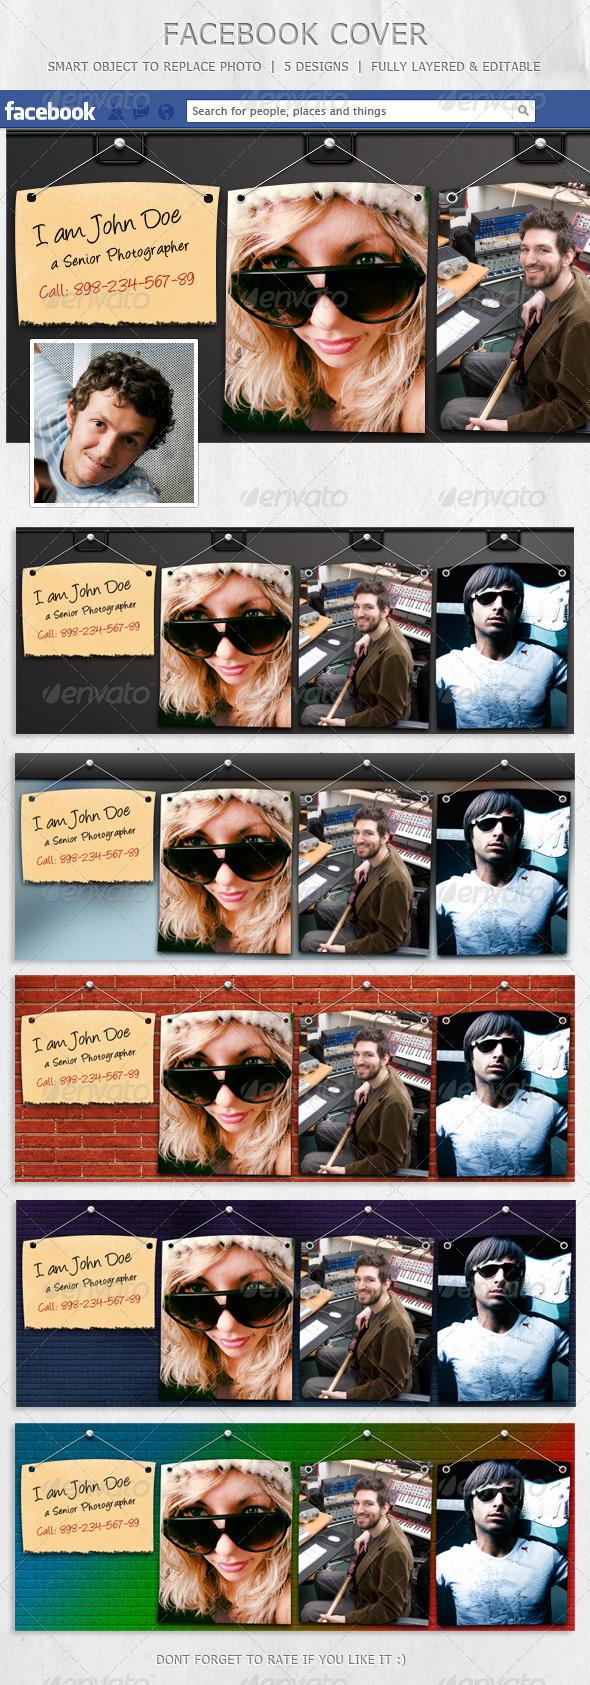 Facebook Cover Designs - Facebook Timeline Covers Social Media